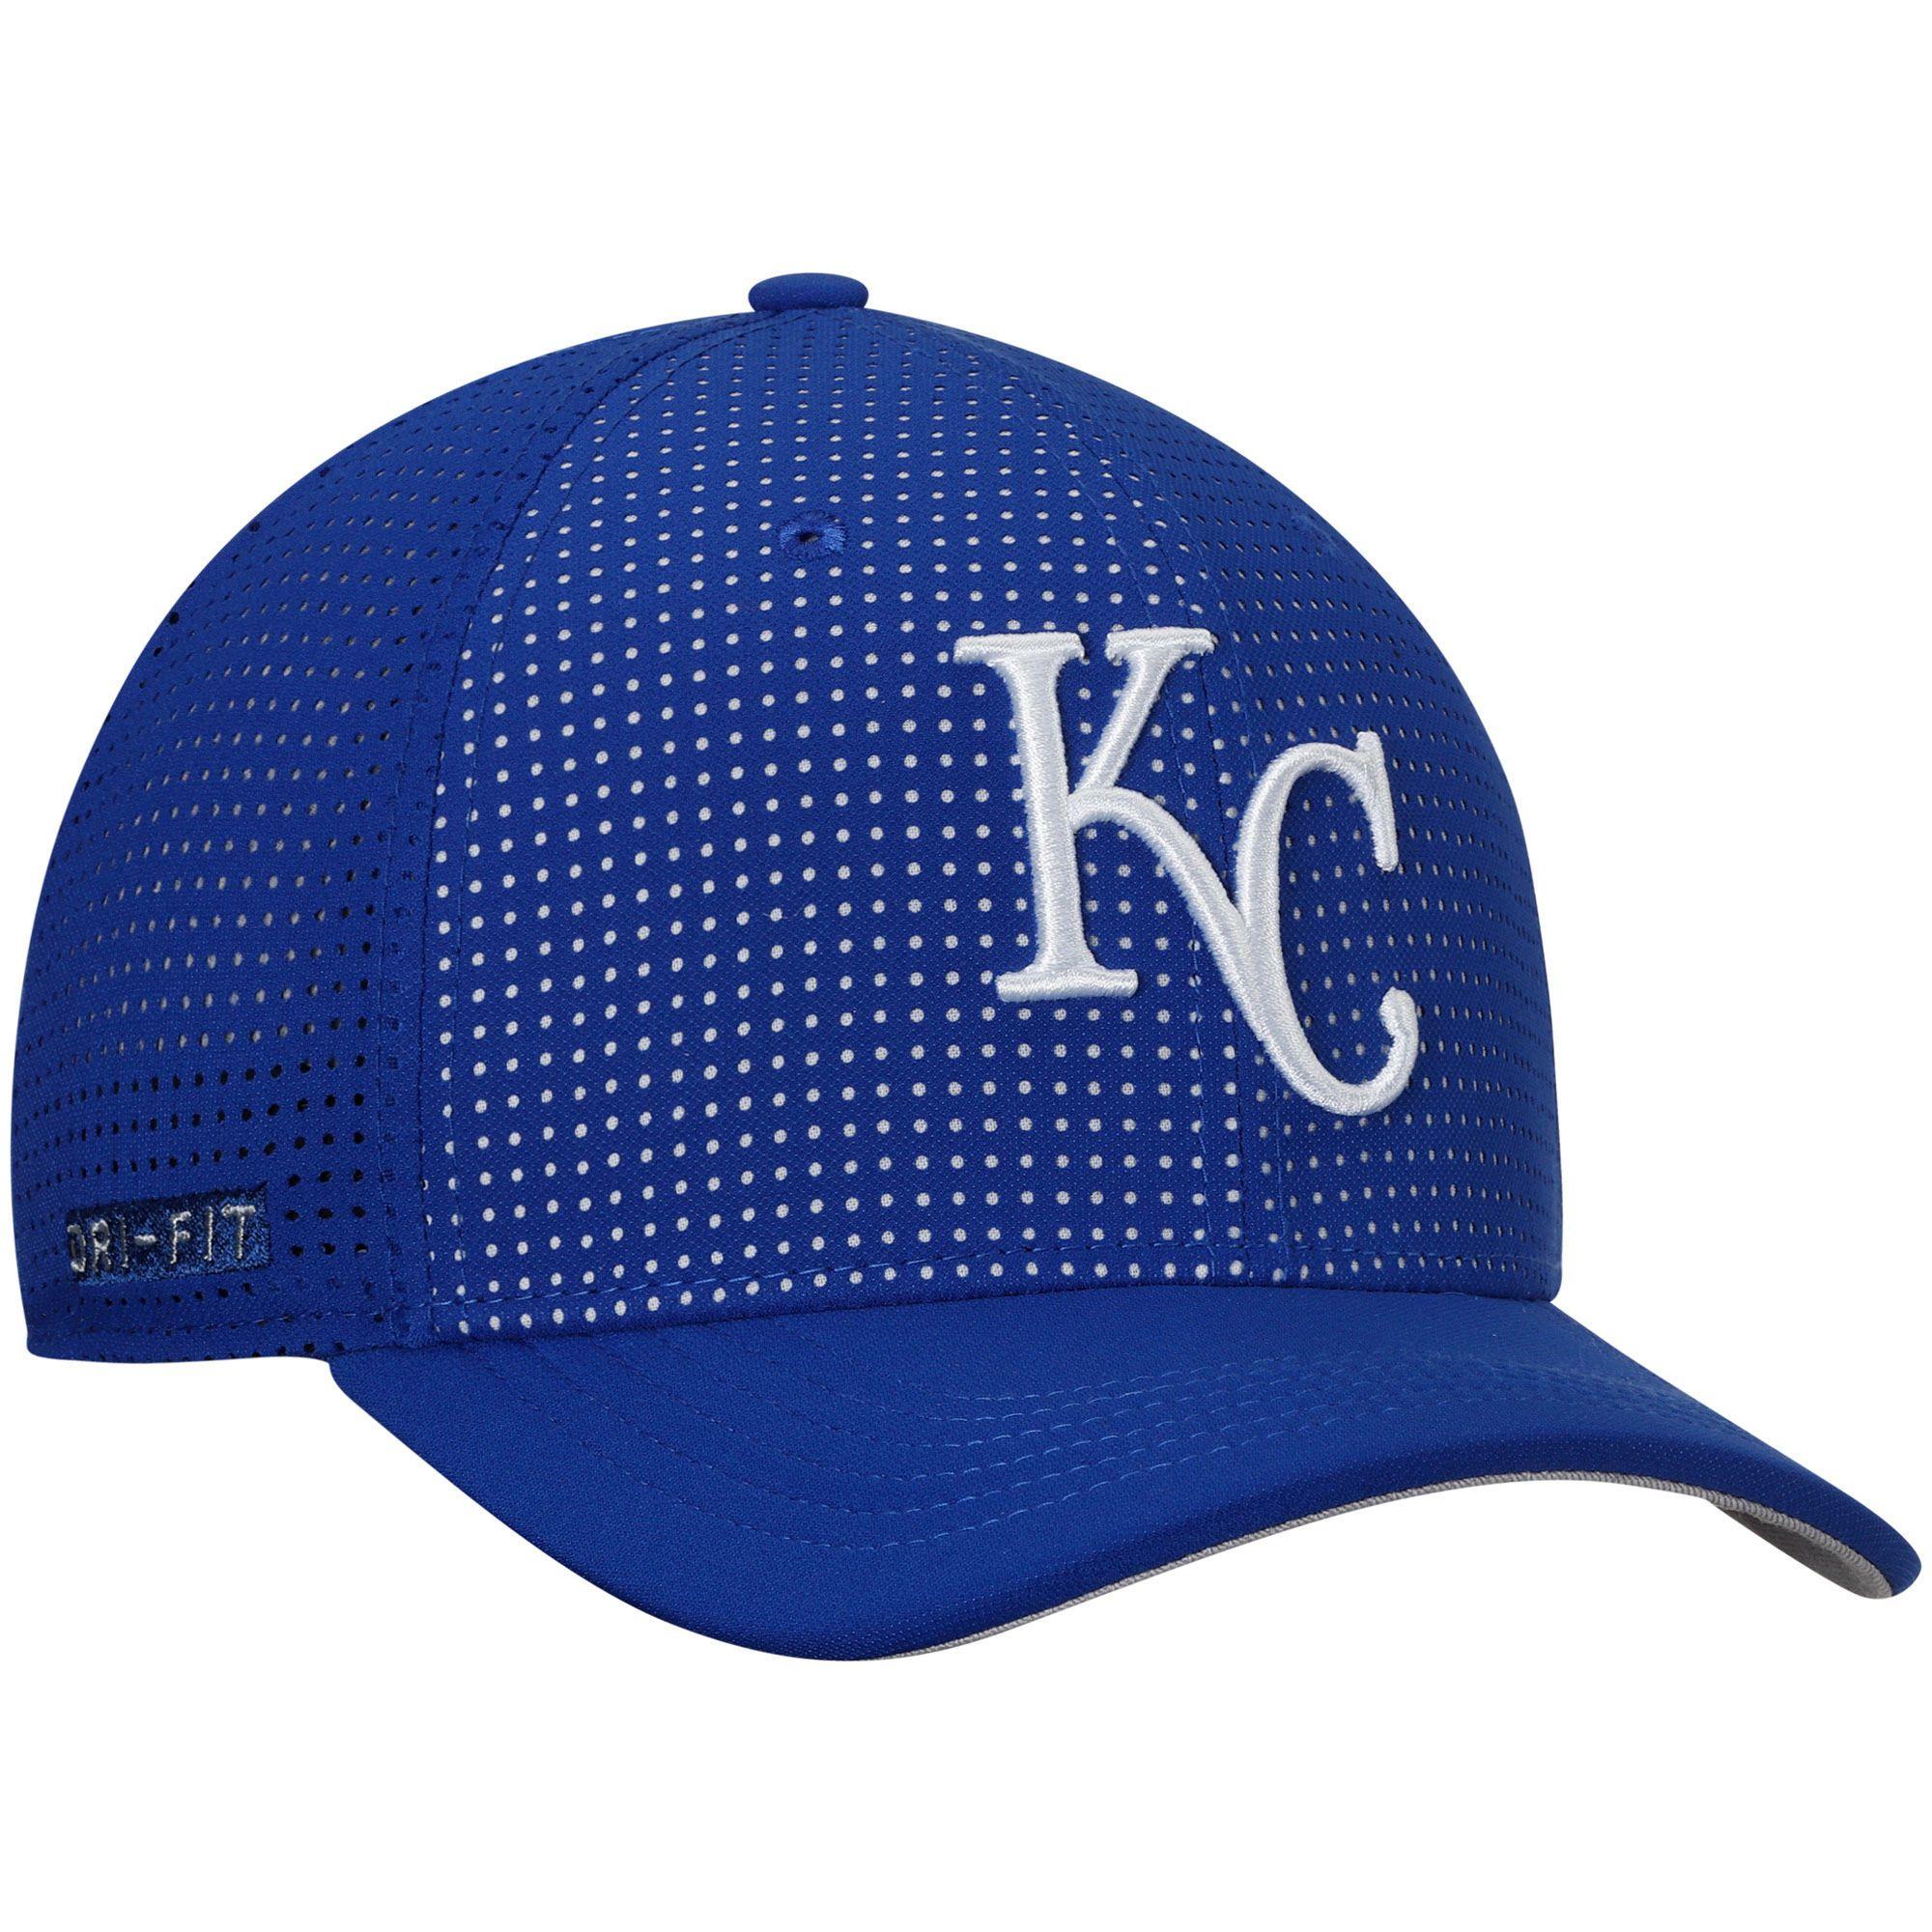 26af49fe31e38 Nike Kansas City Royals Royal AeroBill Classic 99 Performance Adjustable Hat